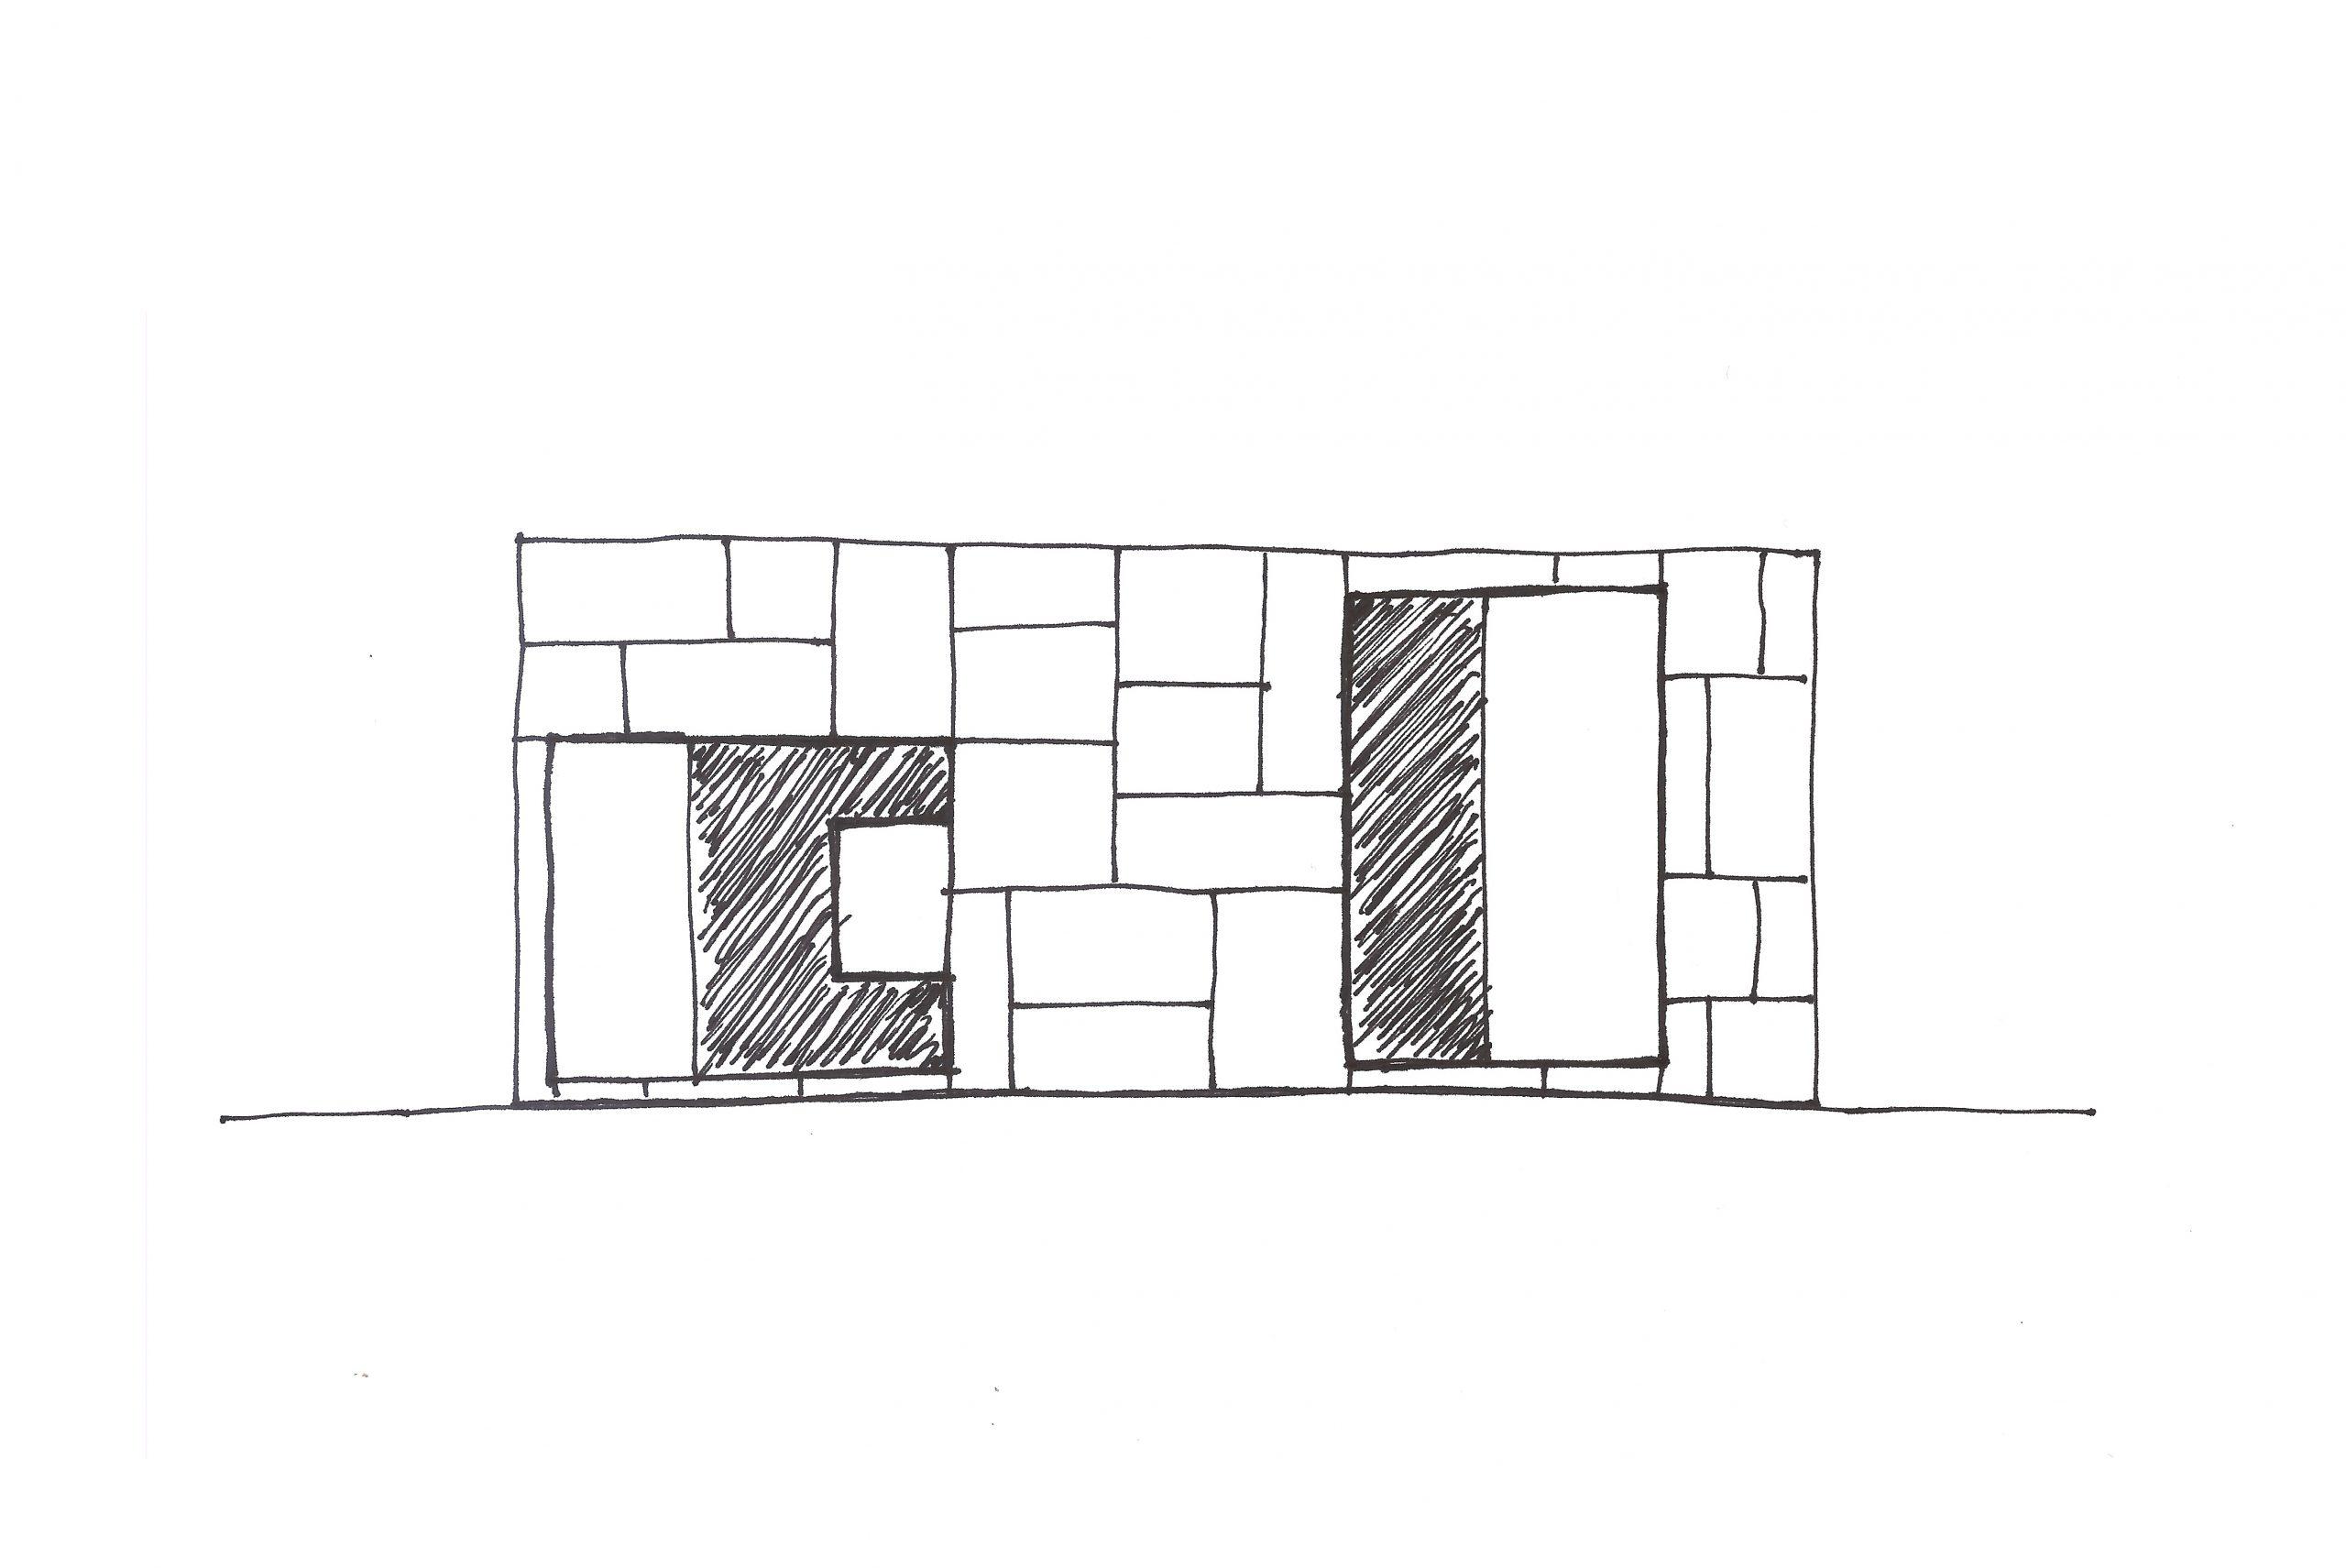 sketch of Showroom Interior Design by Debiasi Sandri for Grassi Pietre